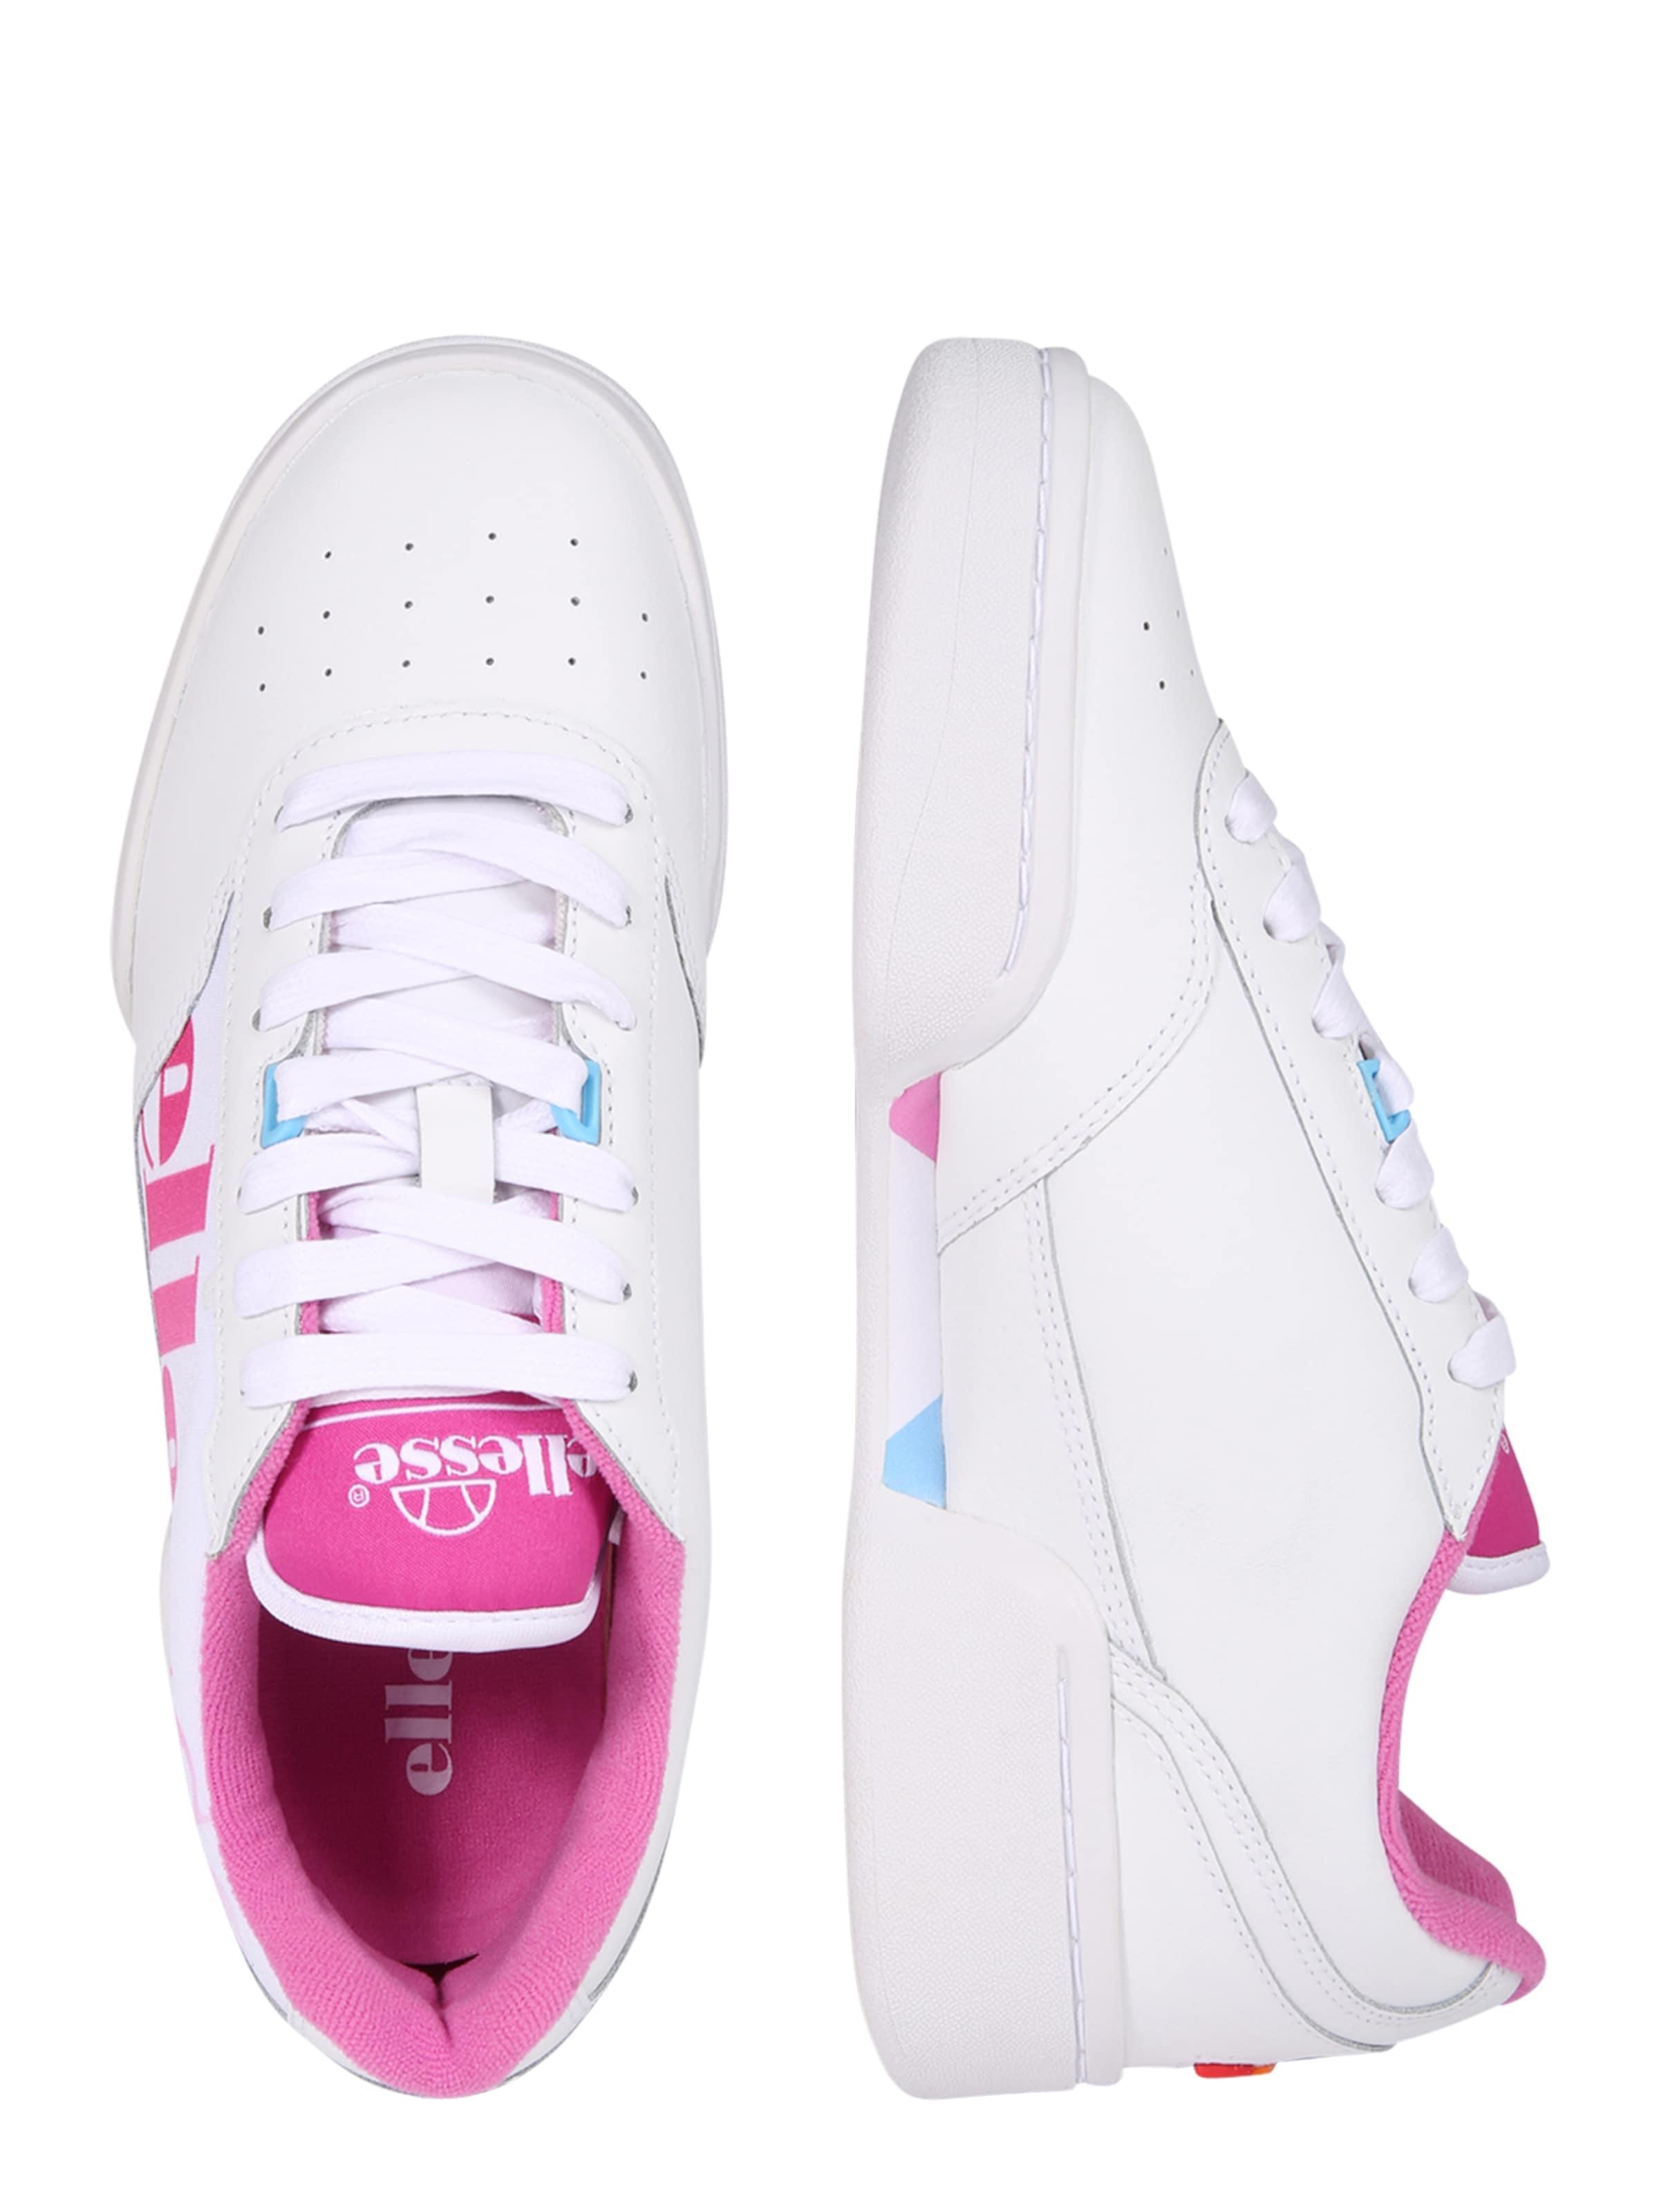 In Sneaker 'piacentino' Ellesse Sneaker Sneaker In PinkWeiß Ellesse PinkWeiß Ellesse 'piacentino' MjSGqpUVLz